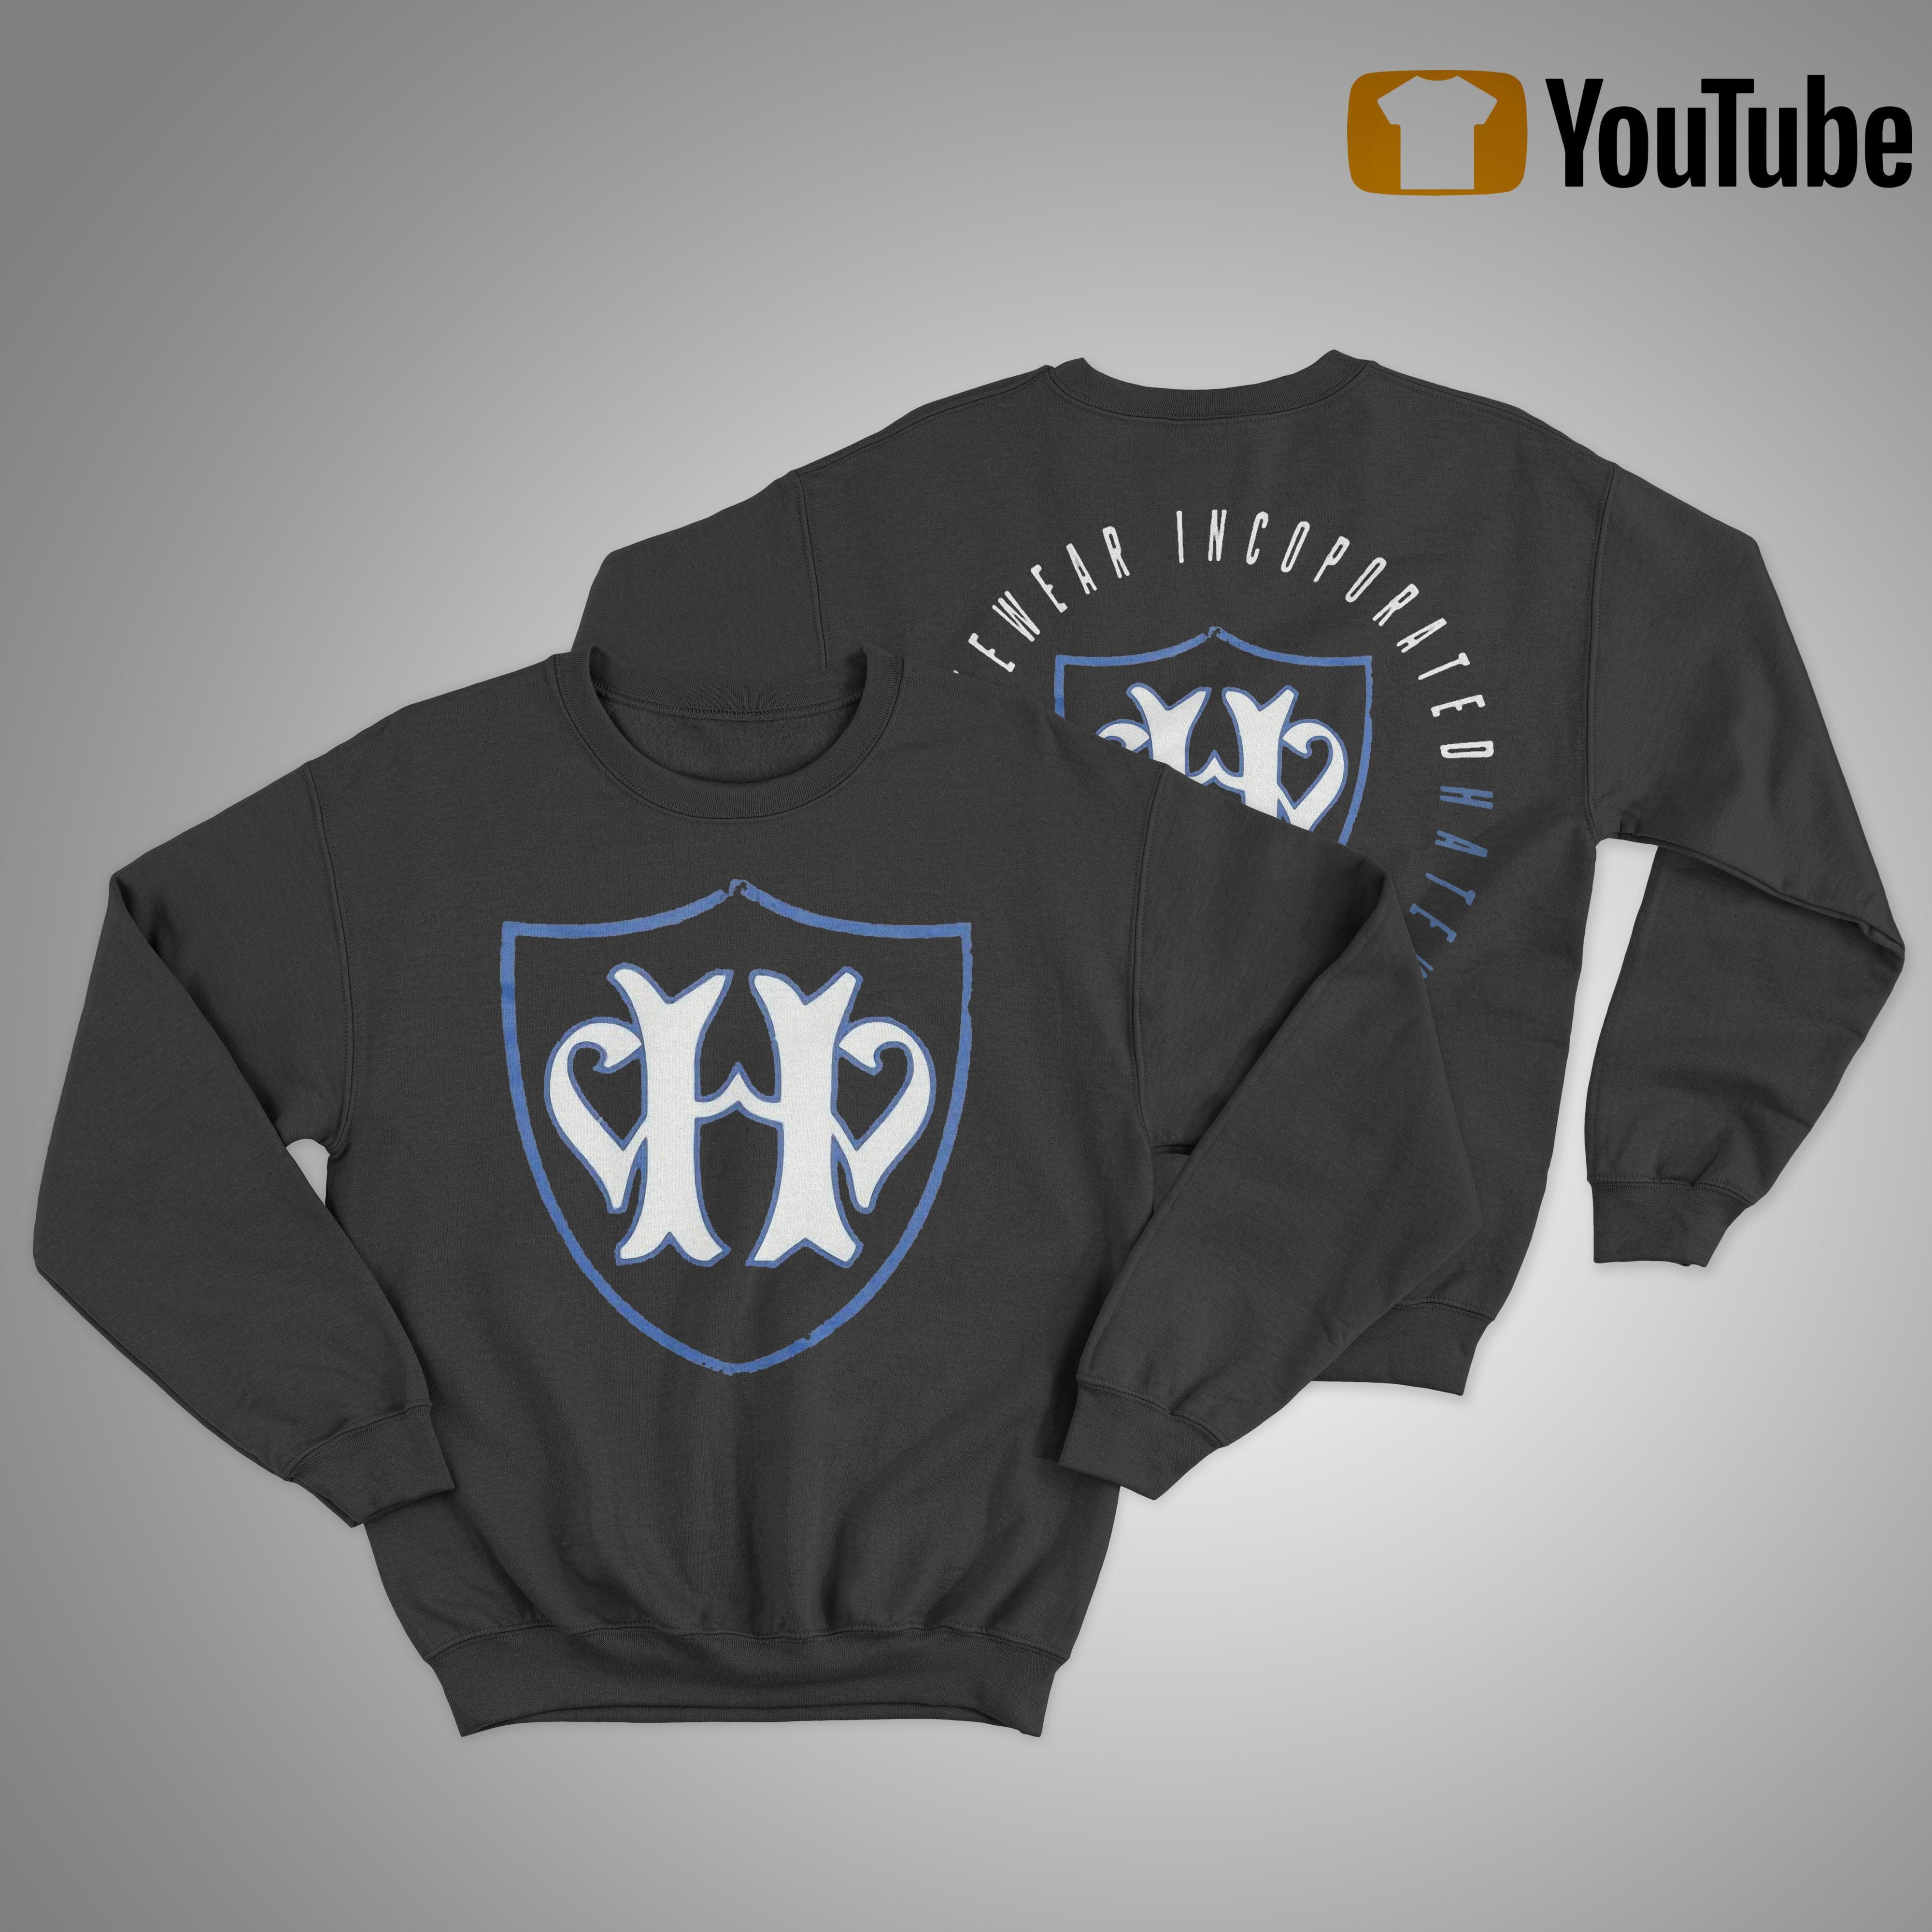 Jamey Jasta Hatewear Incoporated Sweater